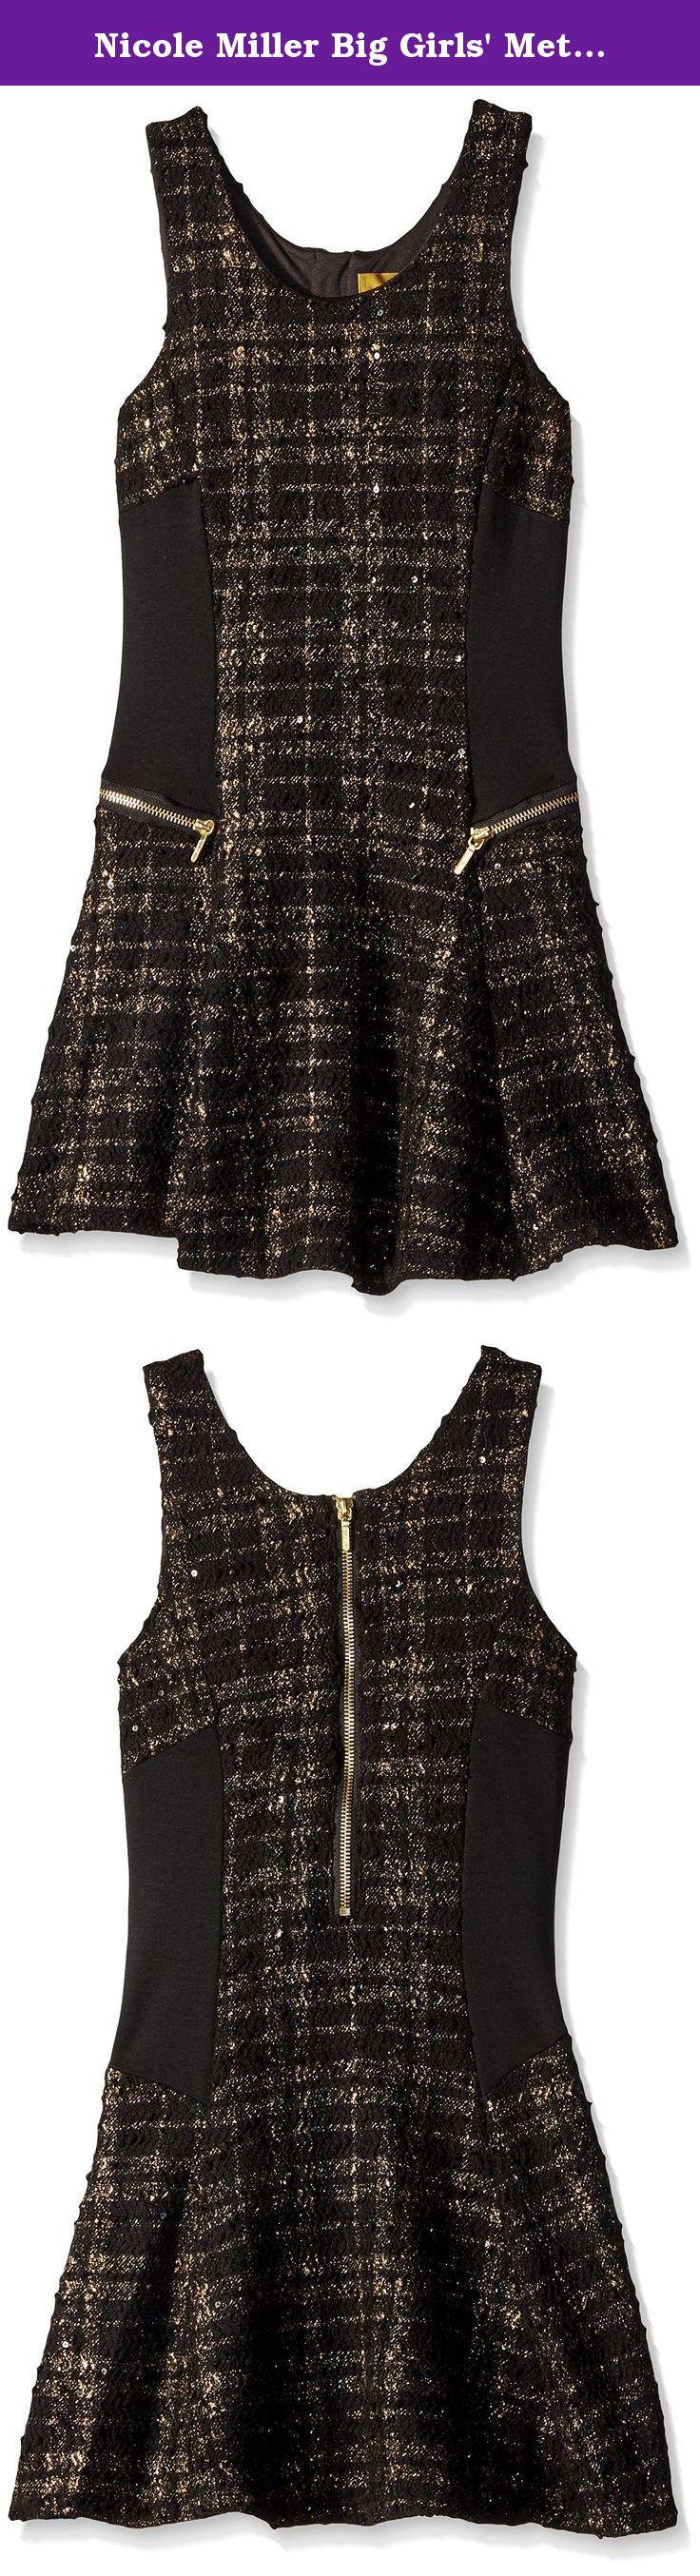 Nicole Miller Big Girls' Metallic Yarn Dyed Knit Boucle Skater Dress, Black, Small. Metallic yarn dyed knit boucle skater dress. Solid knit side panel. Front zip accents.